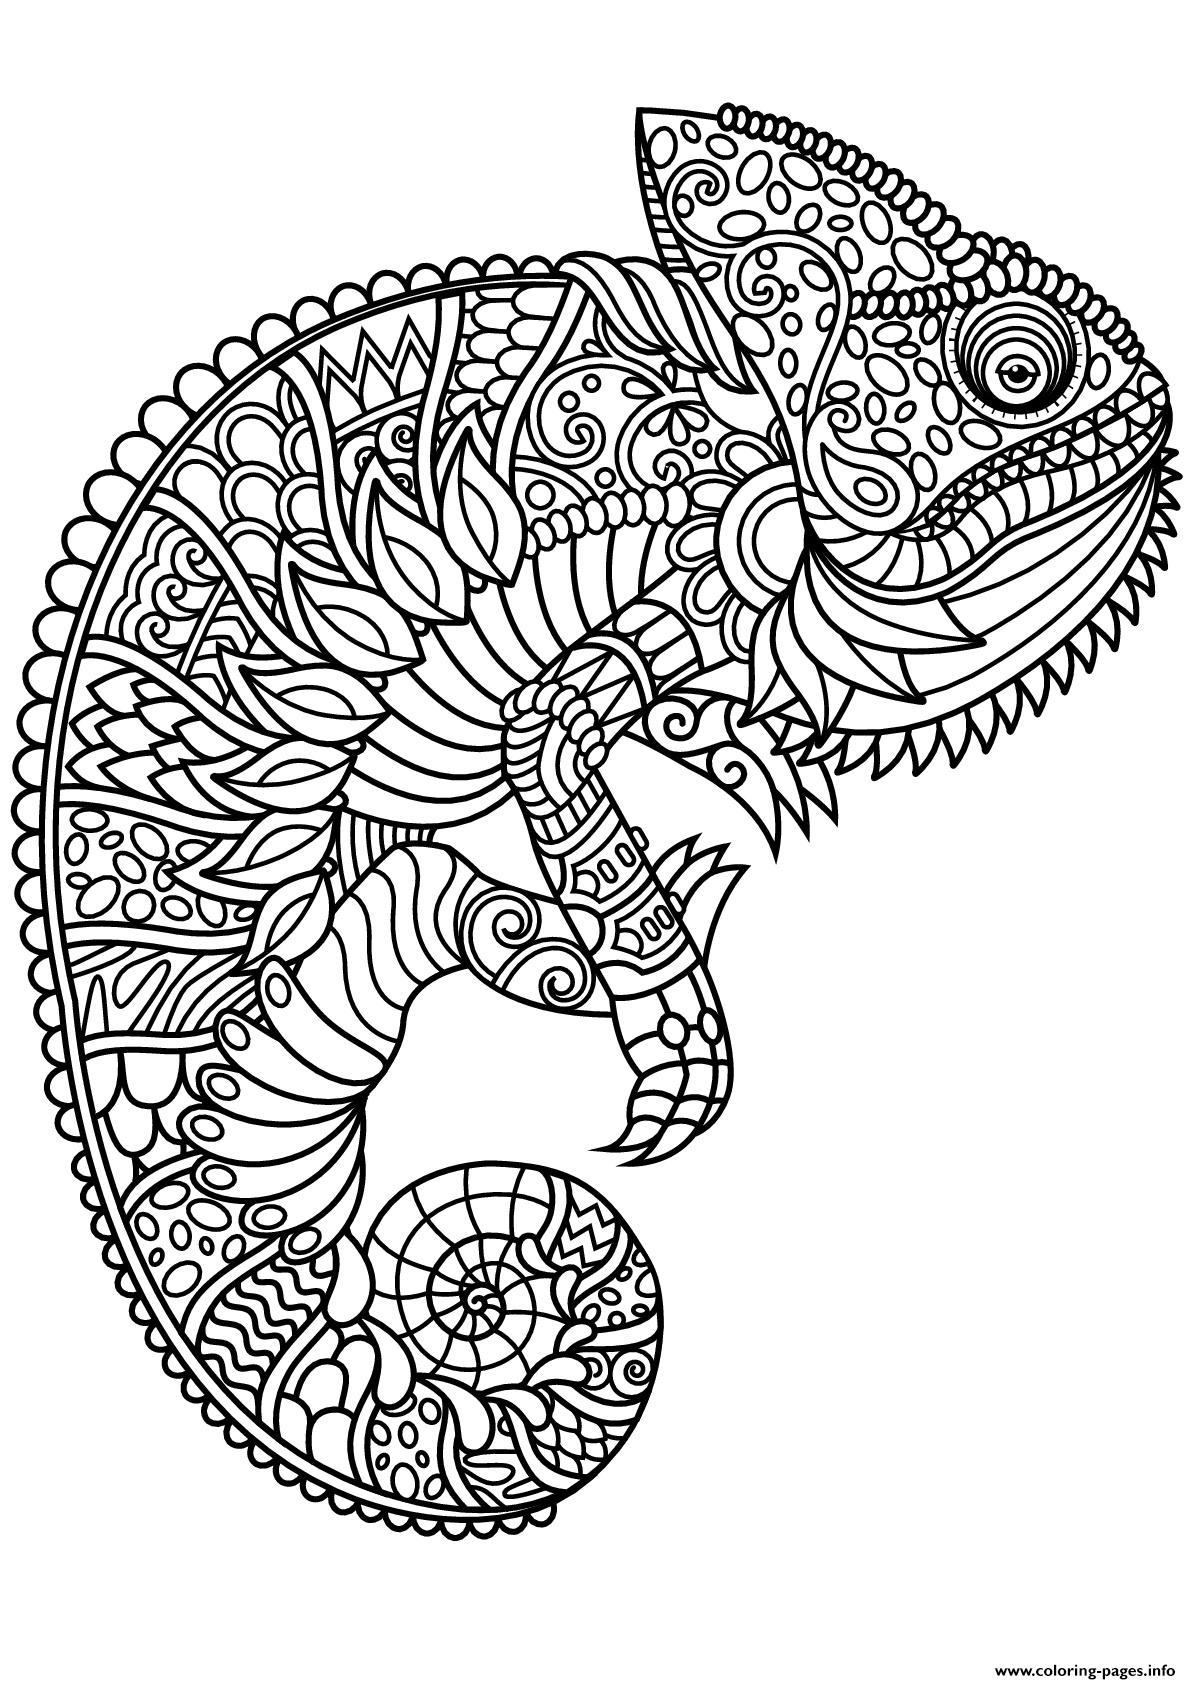 Mandala Chameleon Animal Coloring Pages Printable